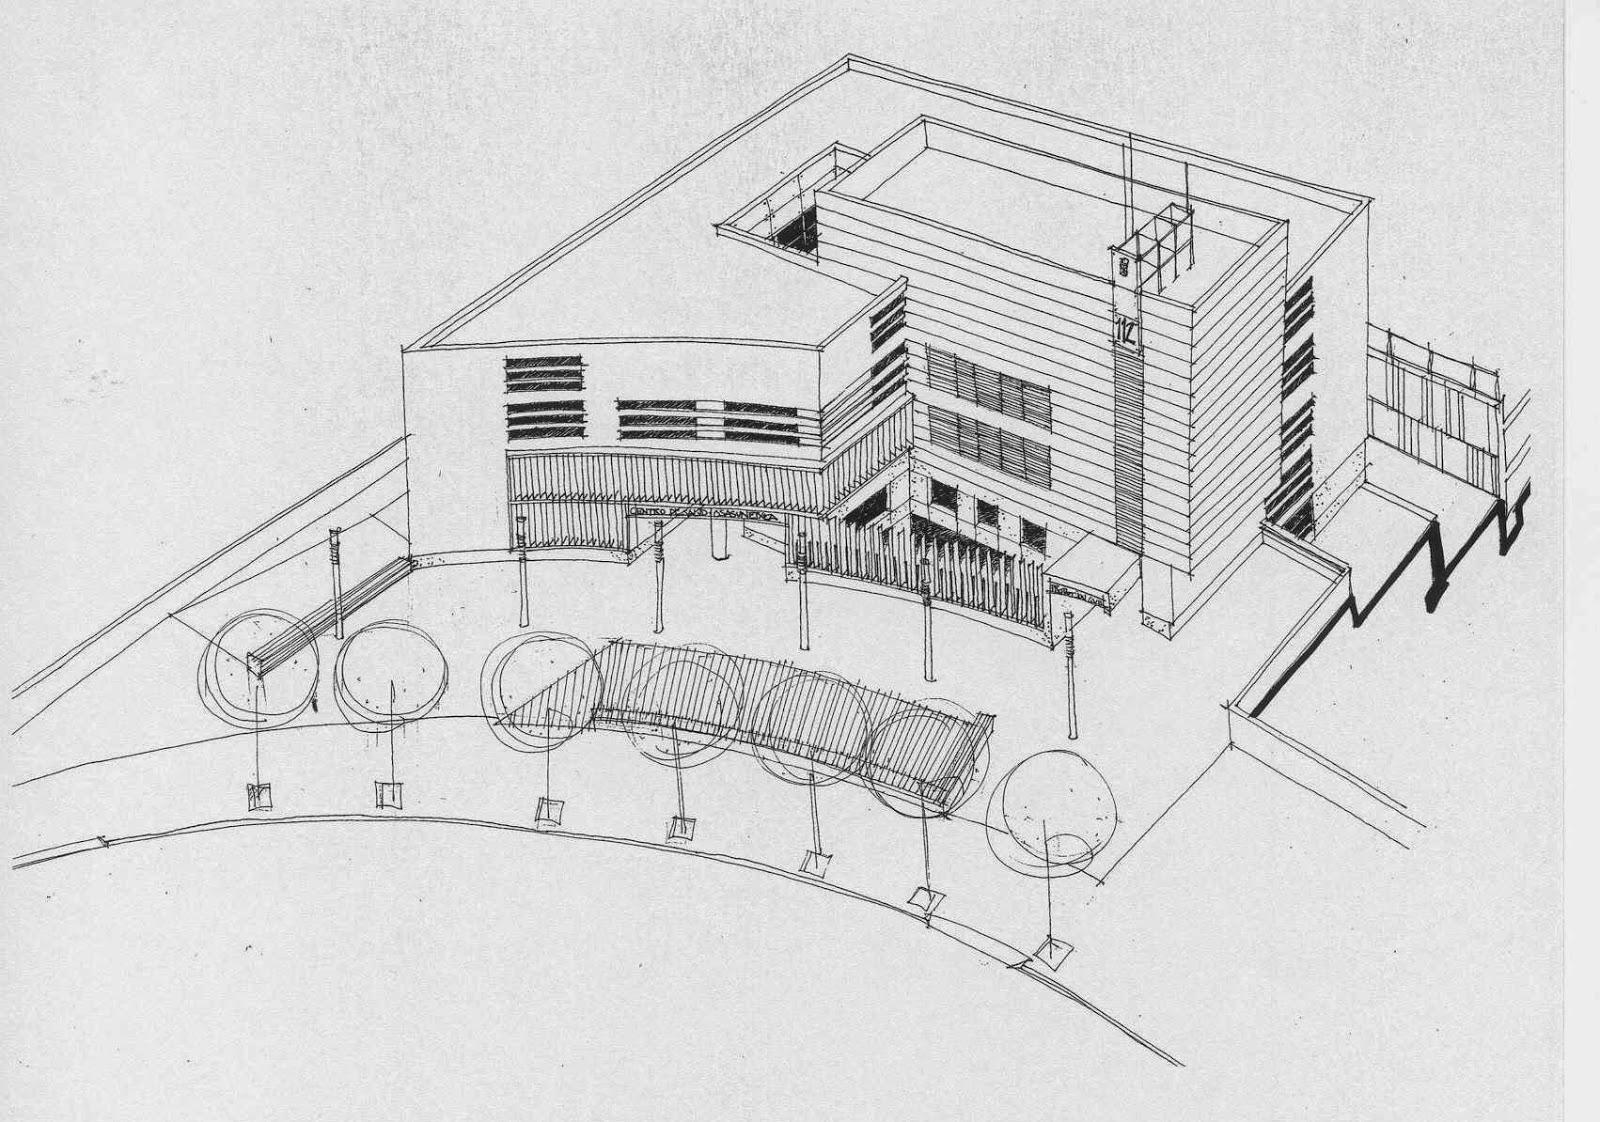 Dibujo t cnico dibujo arquitect nico for Plano de planta dibujo tecnico